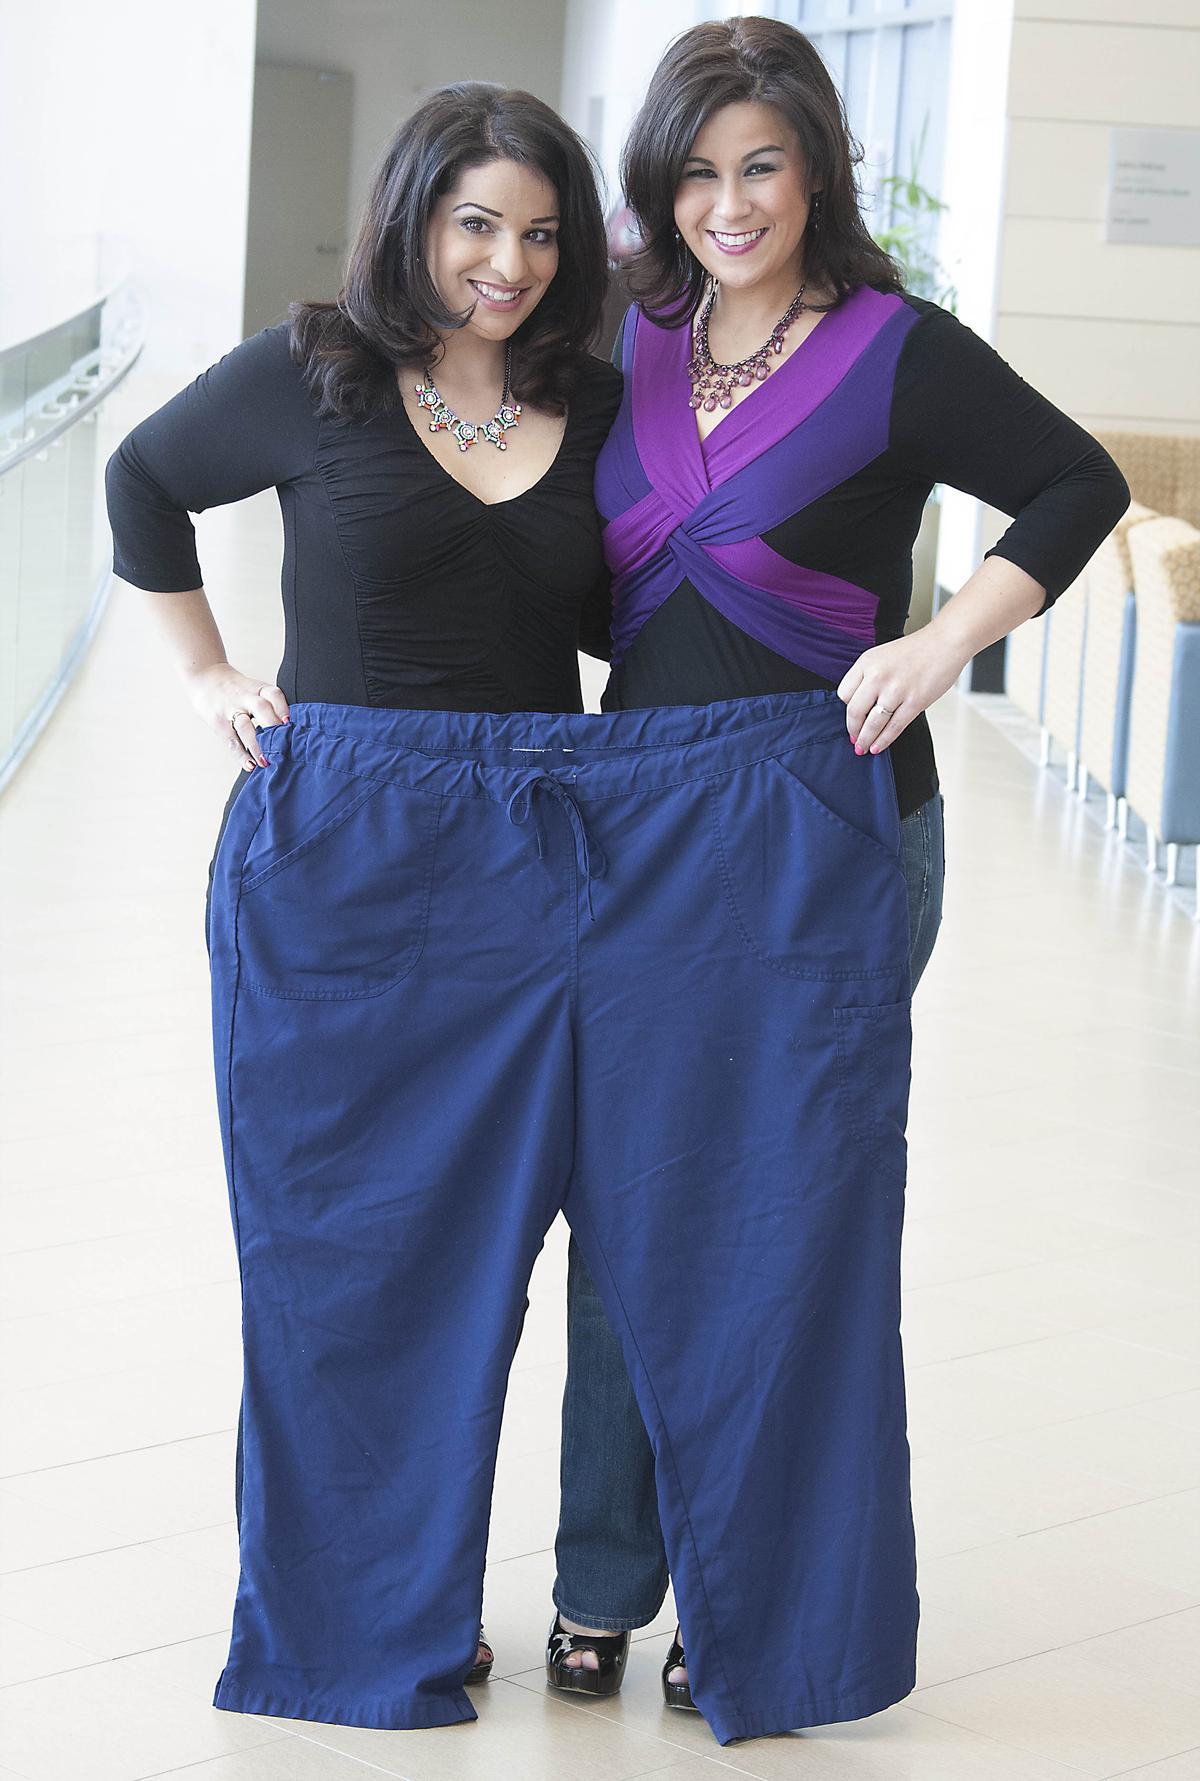 Weight Loss Surgery Inspires Nurses Career Pathway ...